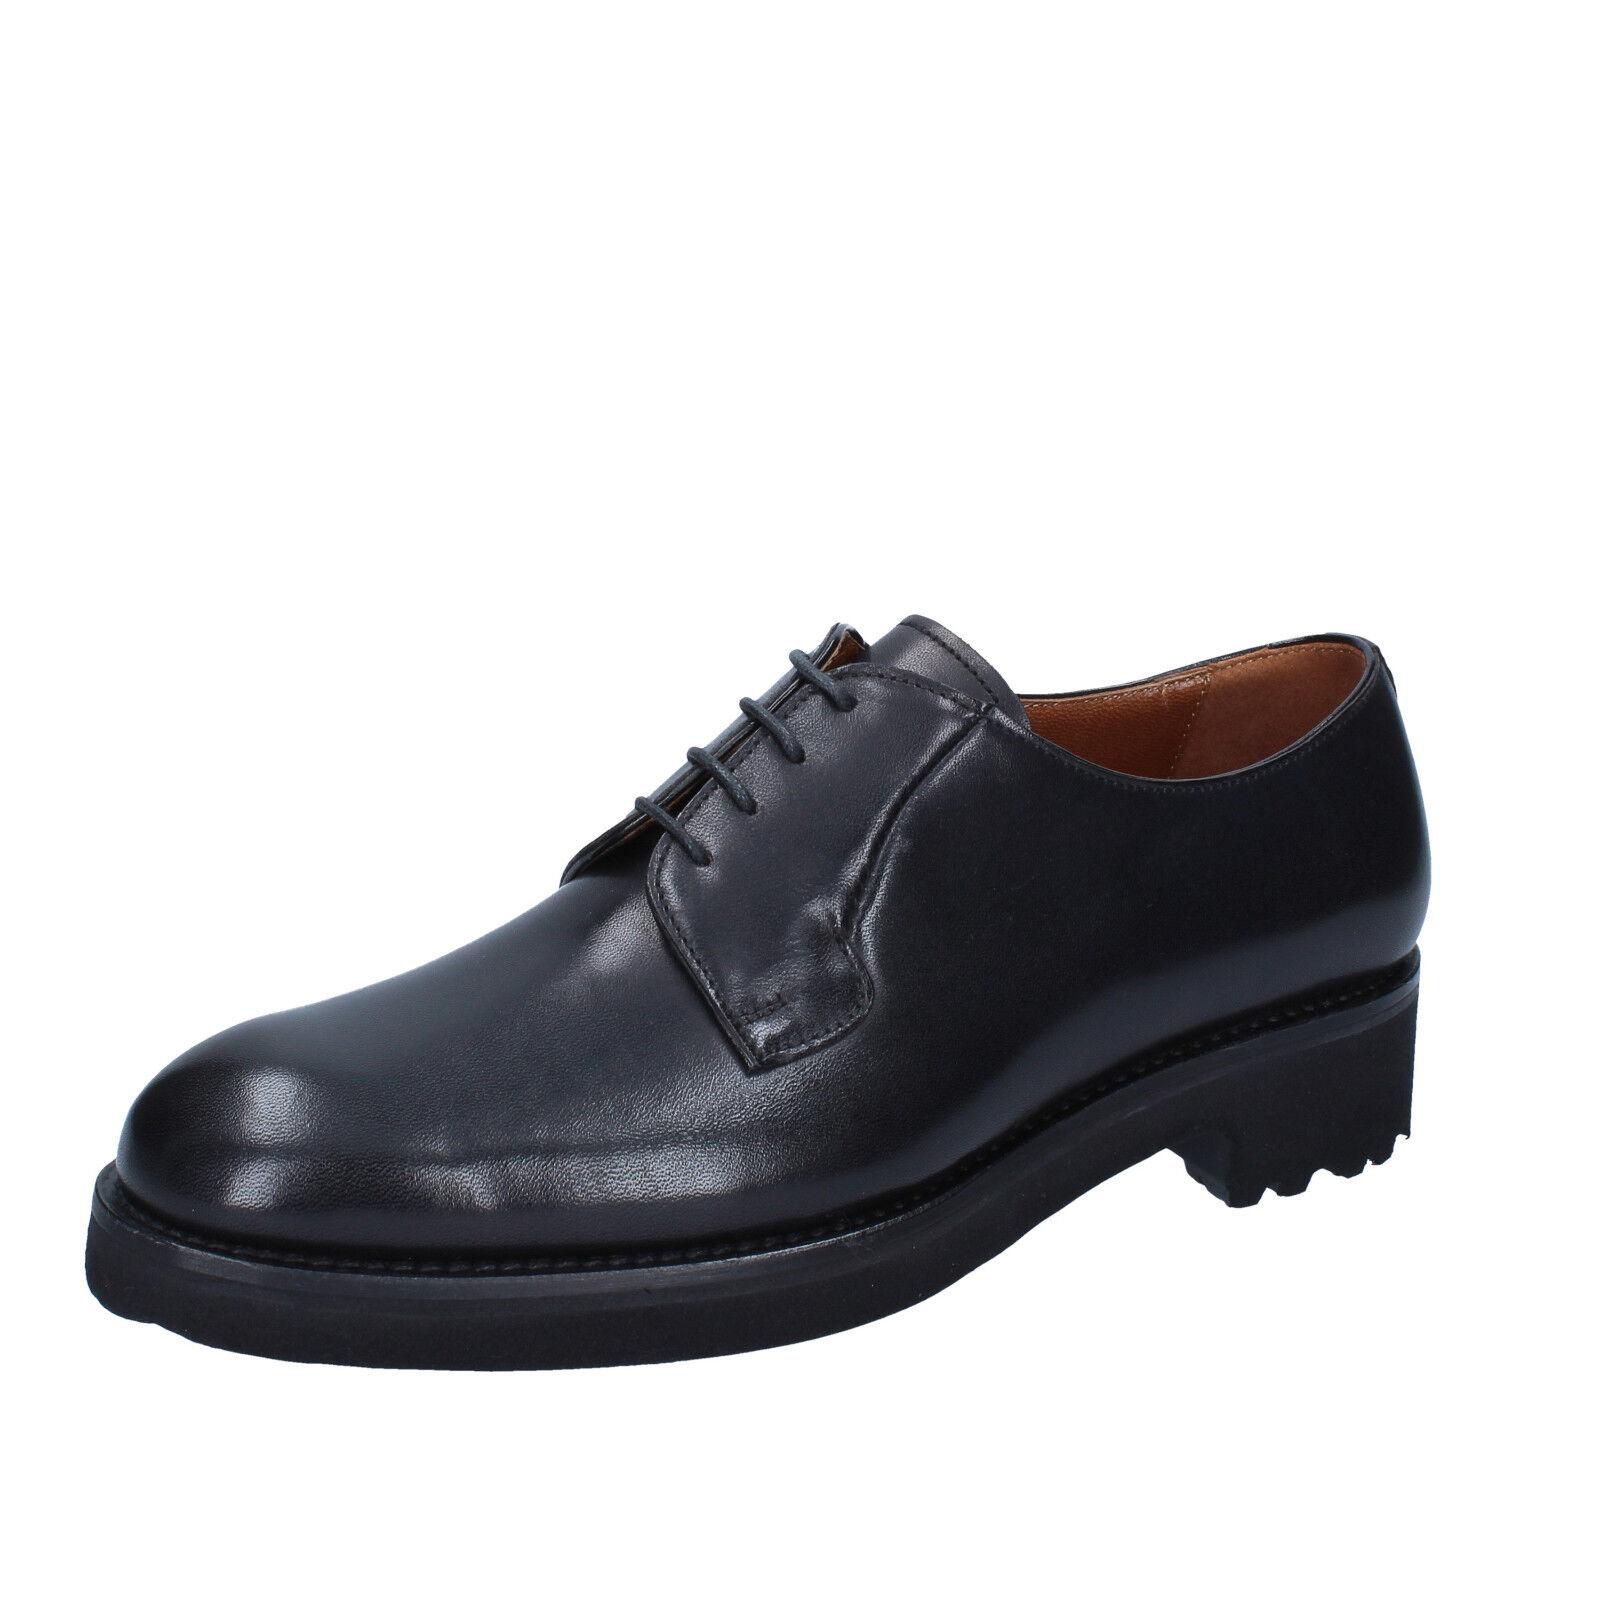 Men's shoes ALEXANDER 7 (EU 40) elegant black leather BY449-40